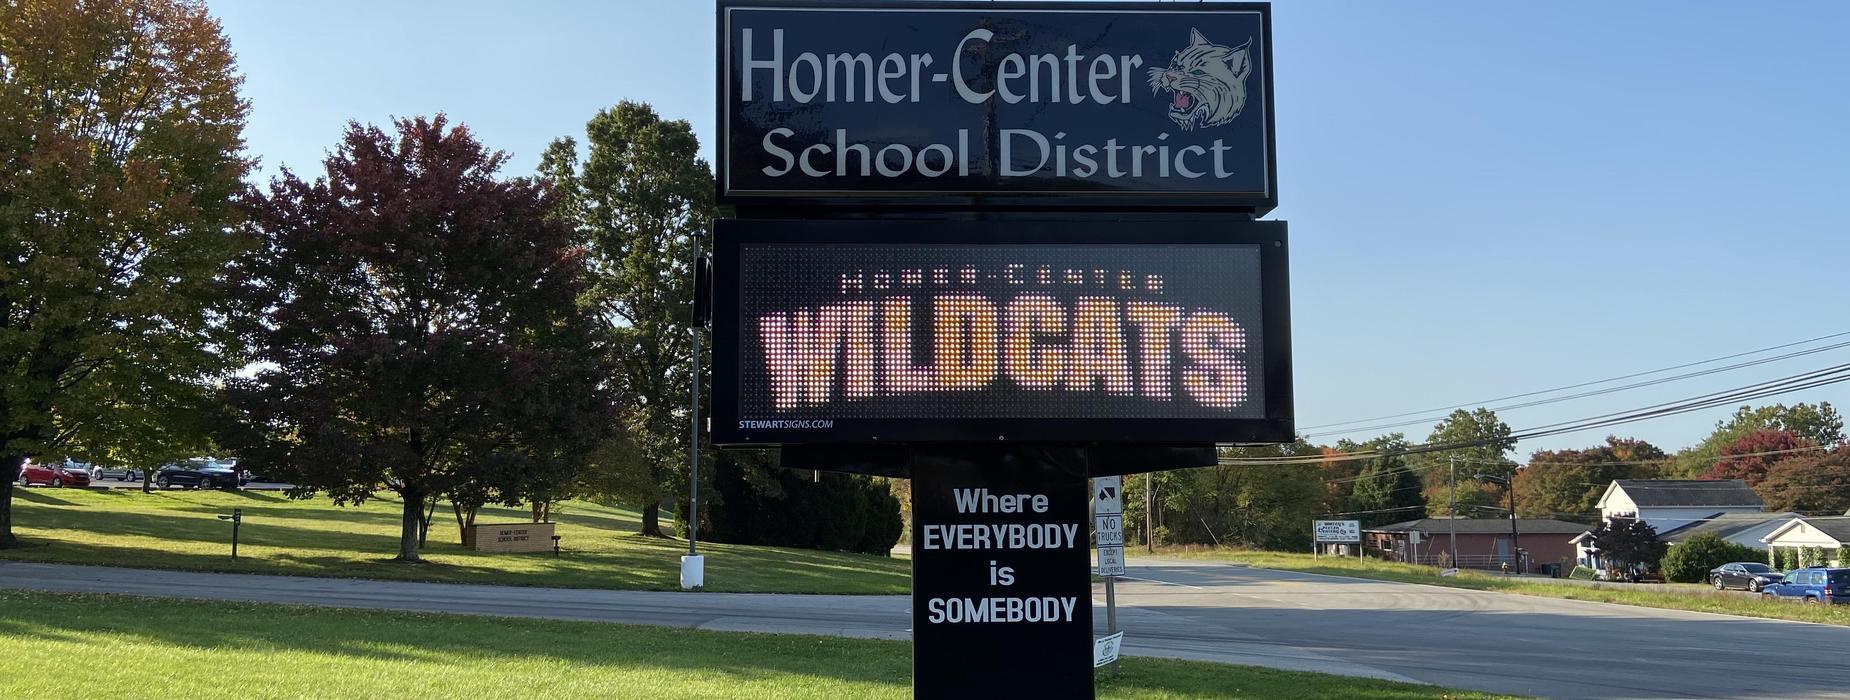 HC School District